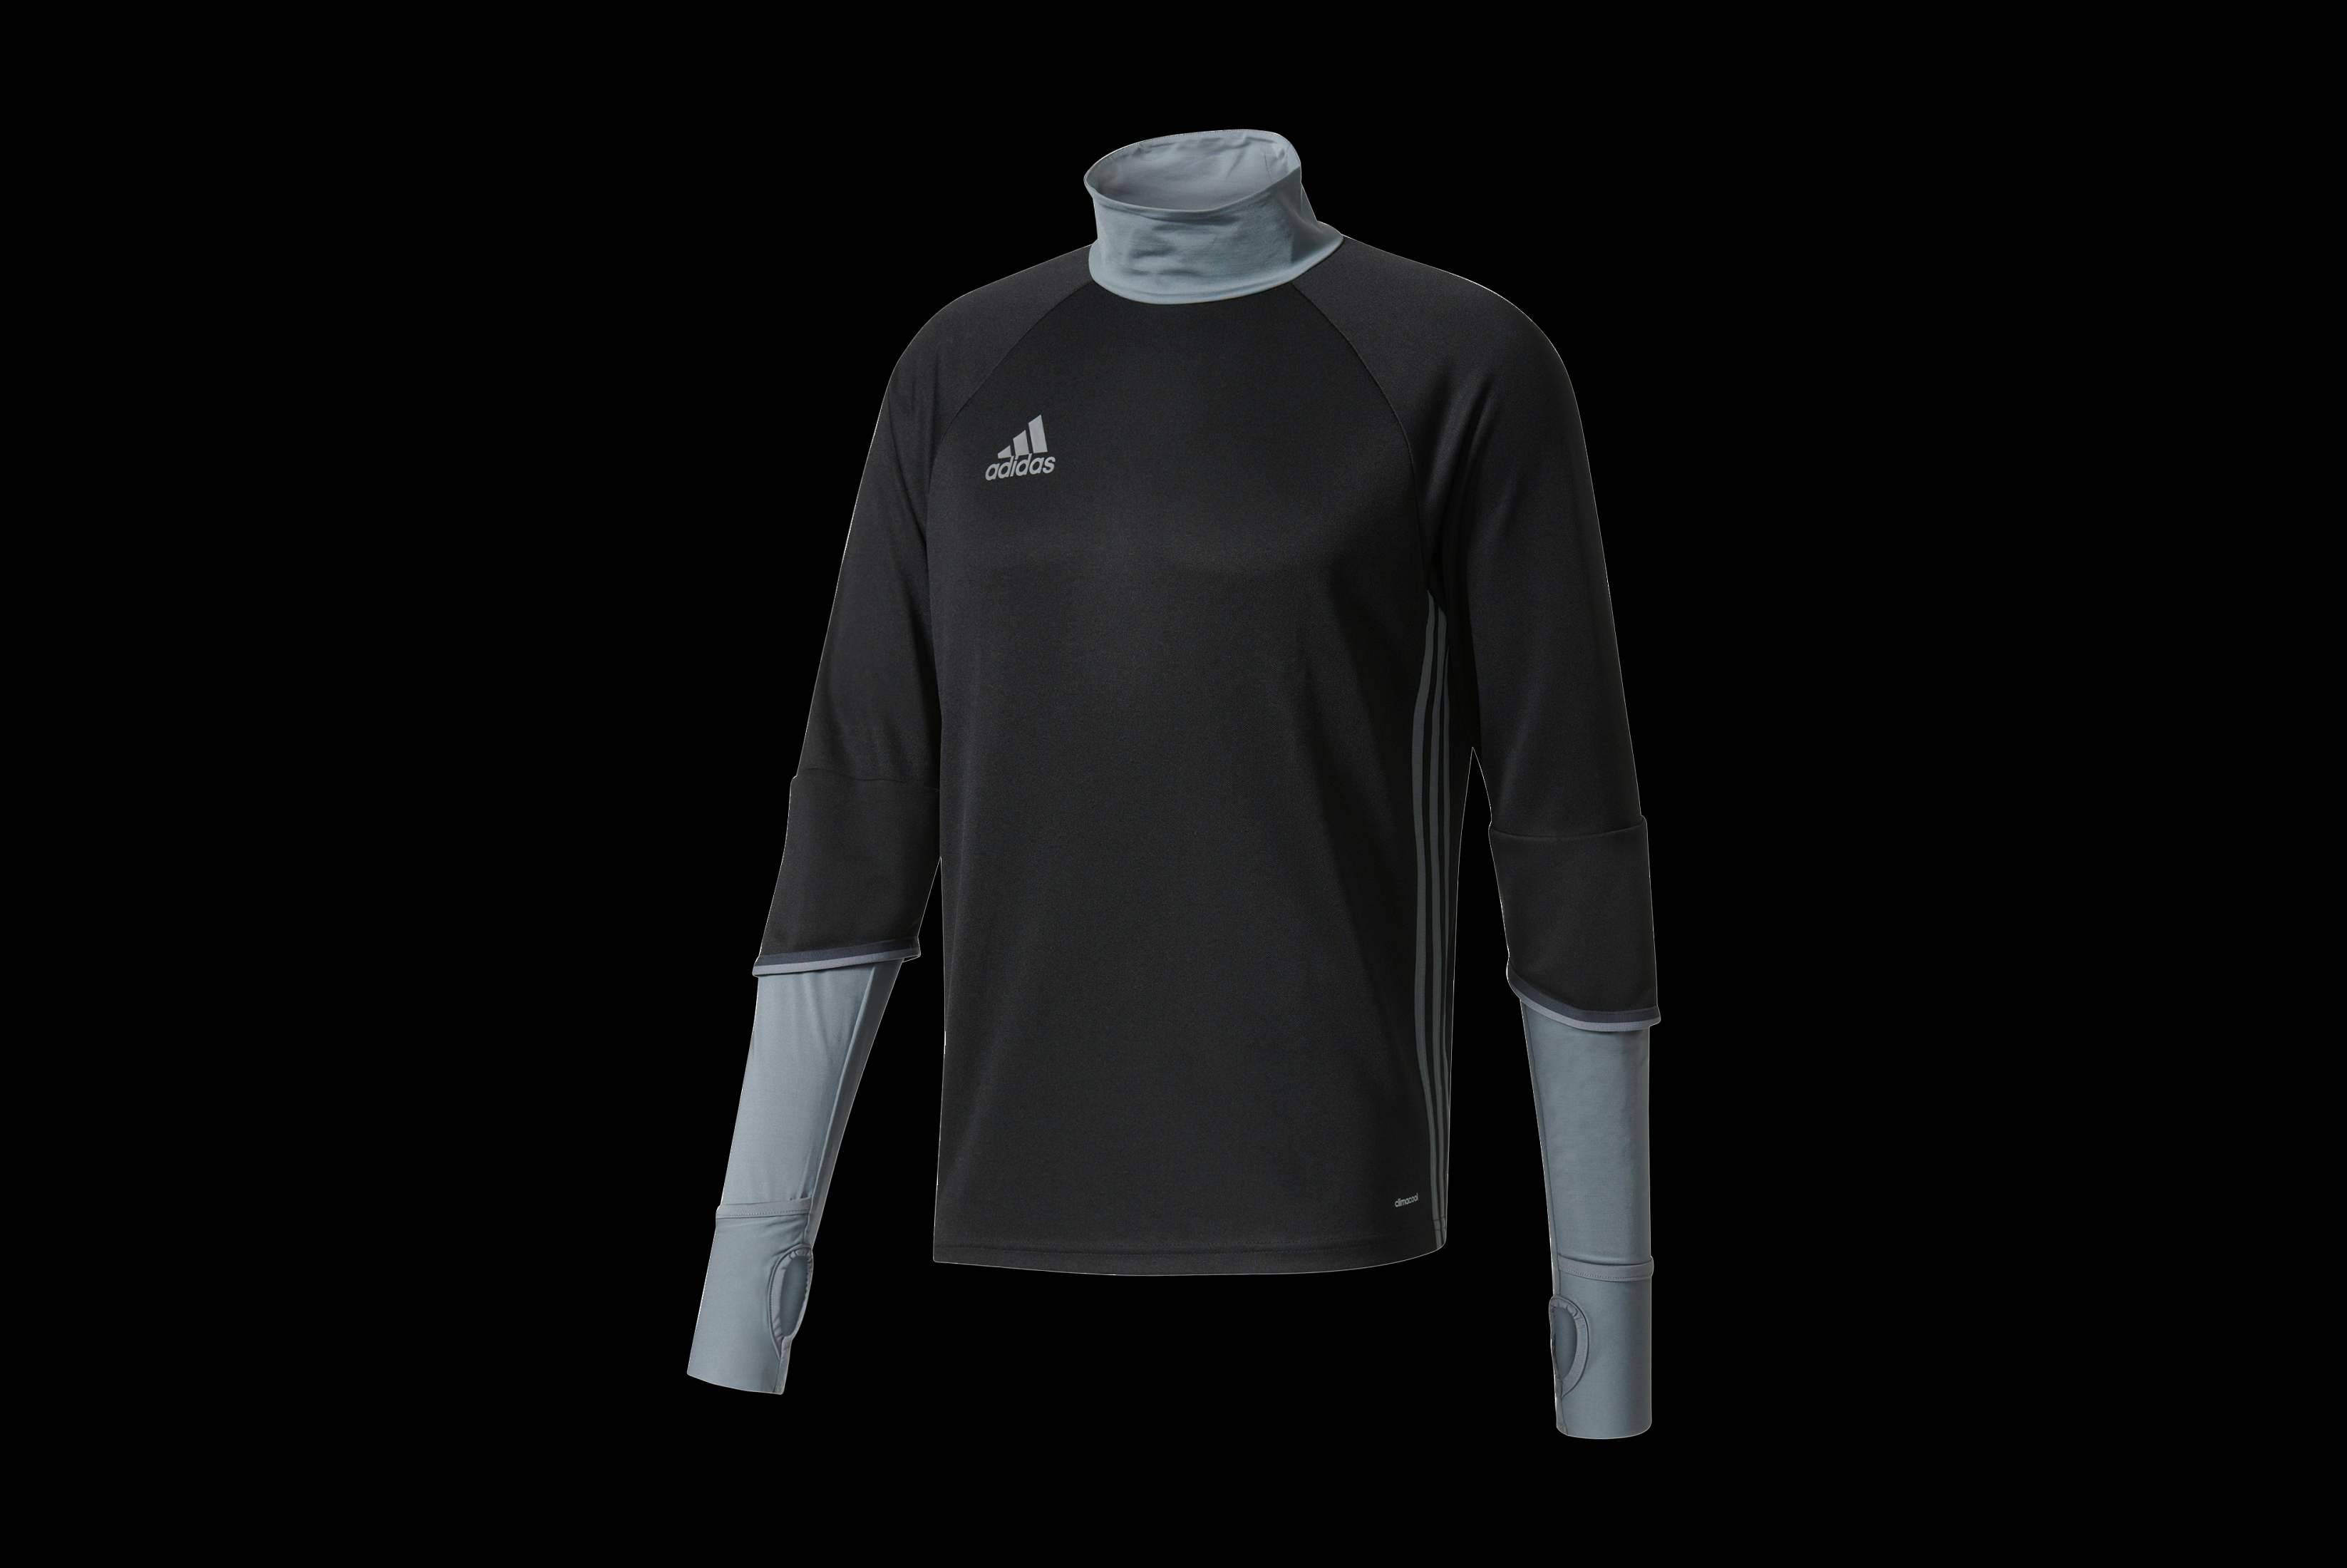 Sweatshirt Adidas Condivo 16 Training S93543 R Gol Com Football Boots Equipment [ 2200 x 3293 Pixel ]